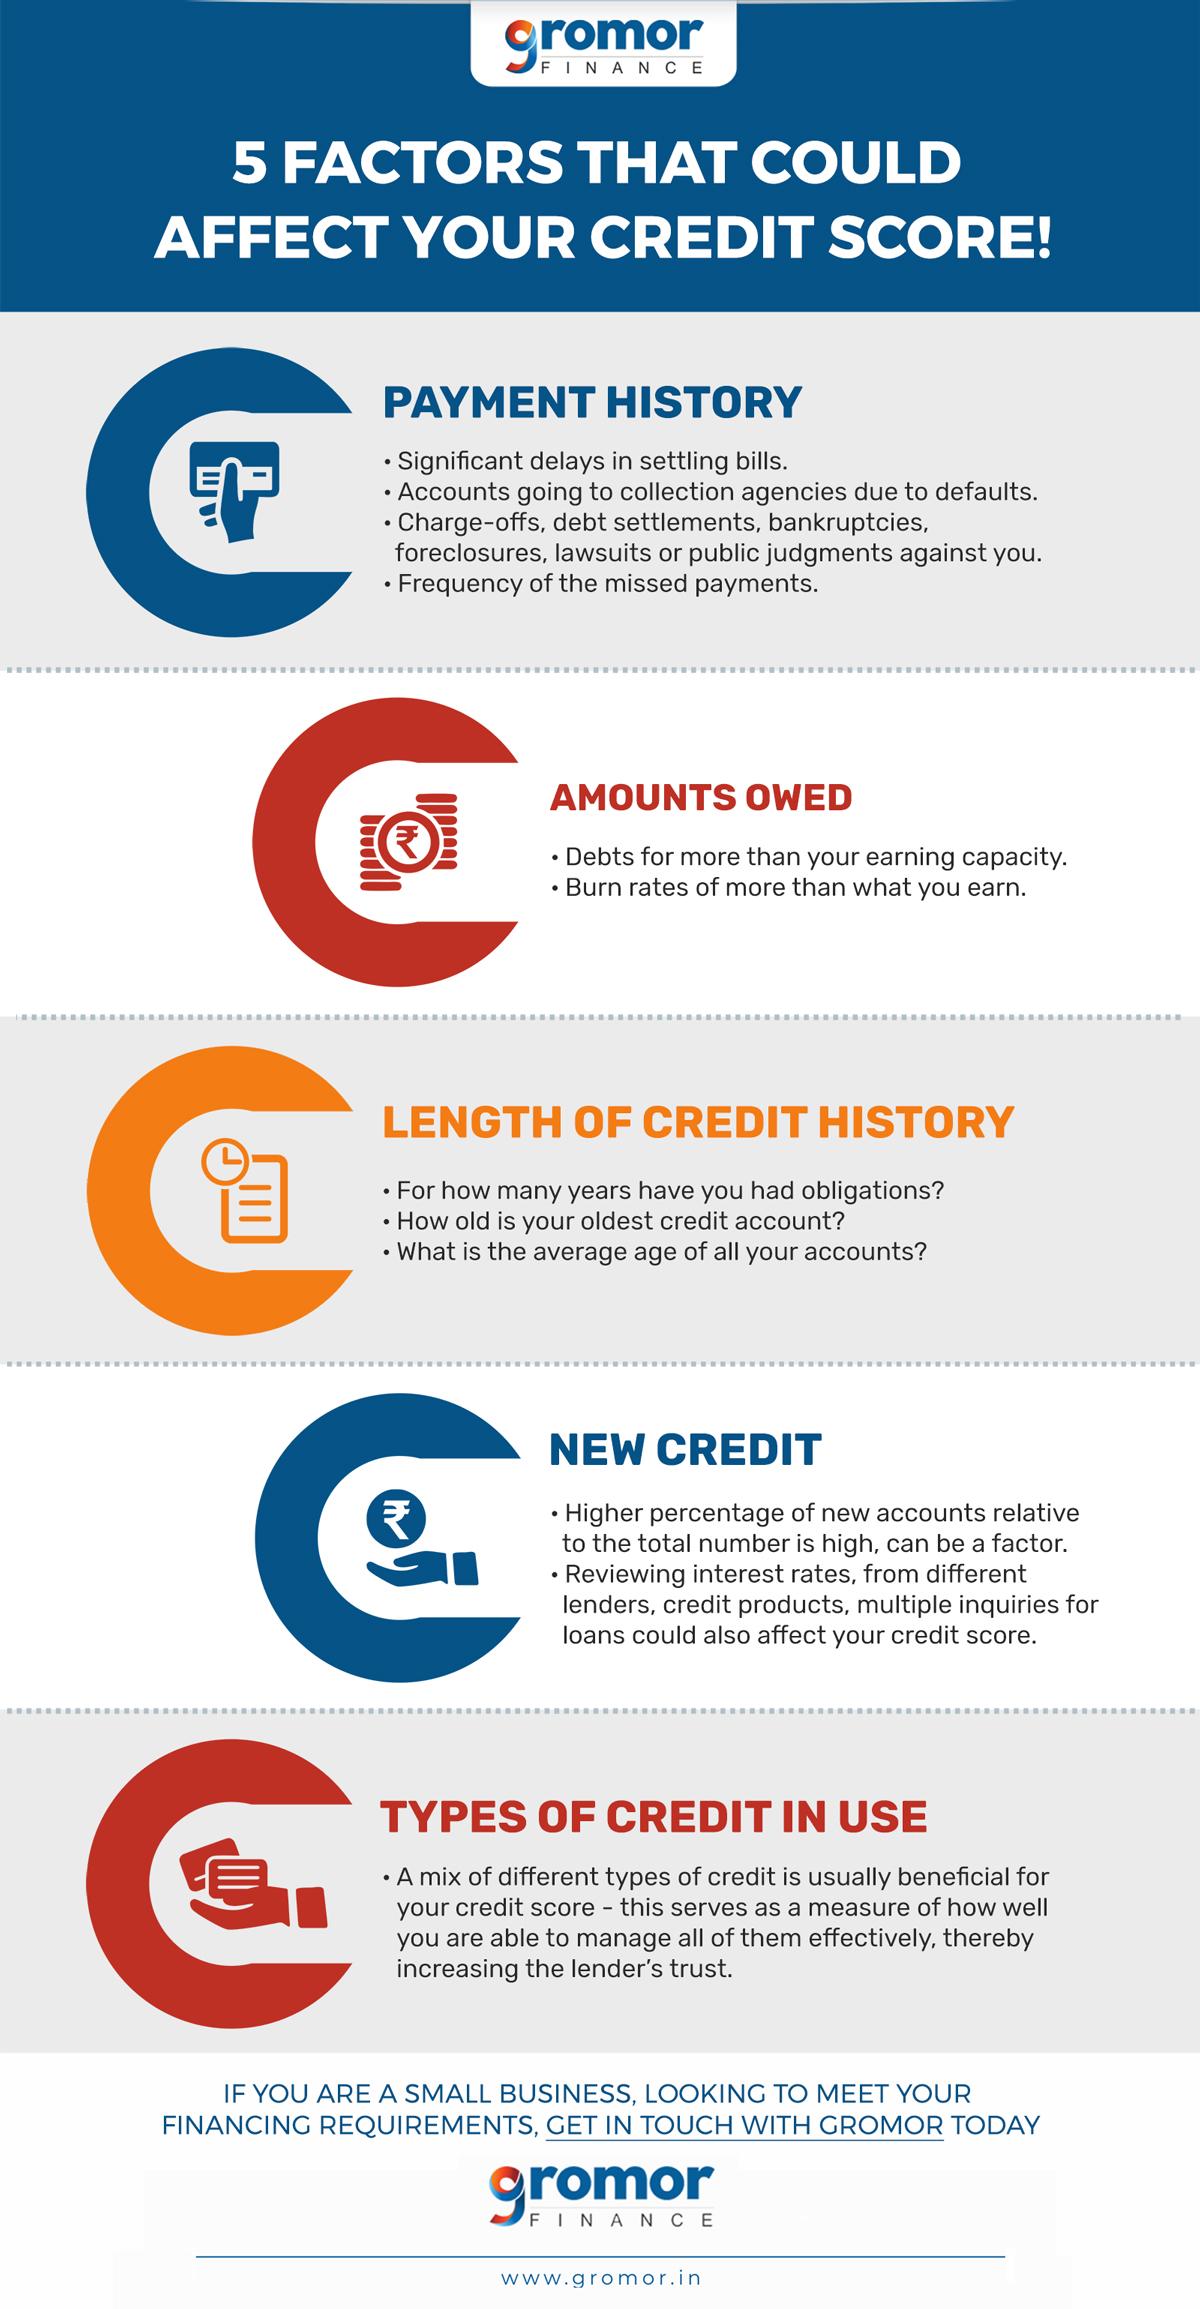 Factors-affecting-credit-score-visual-guide